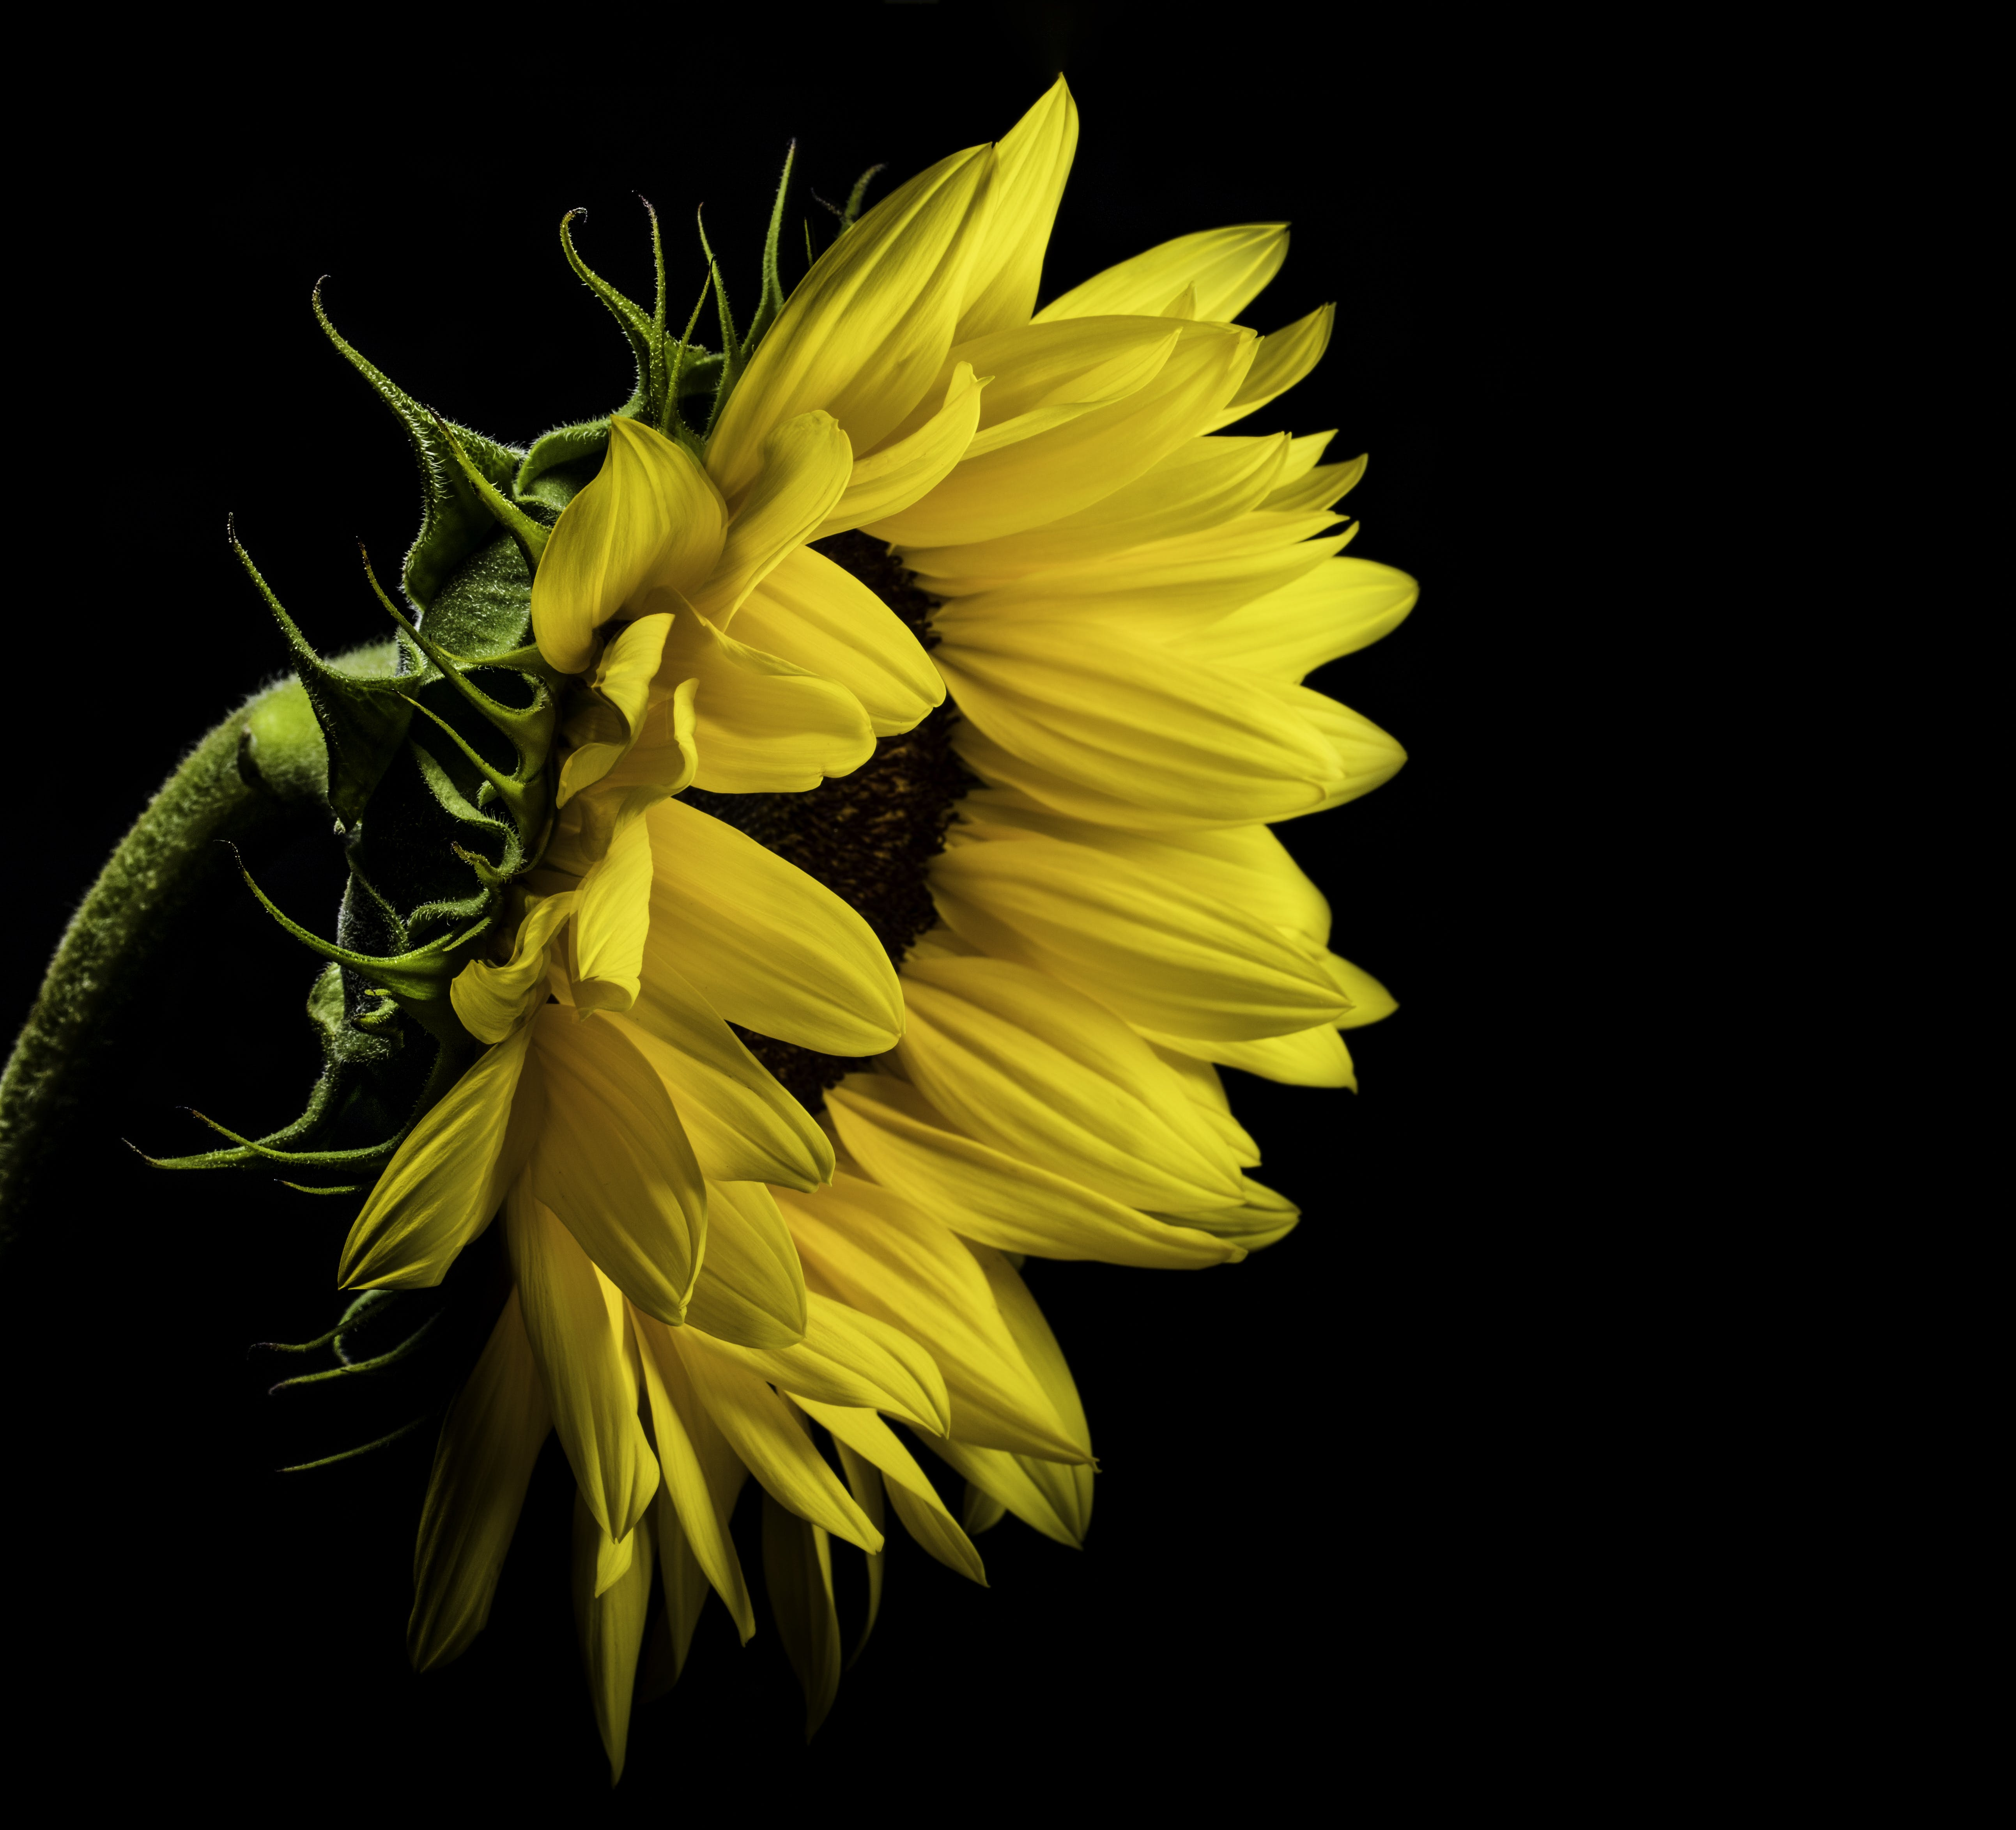 Close Photo of Yellow Sunflower on Black Background